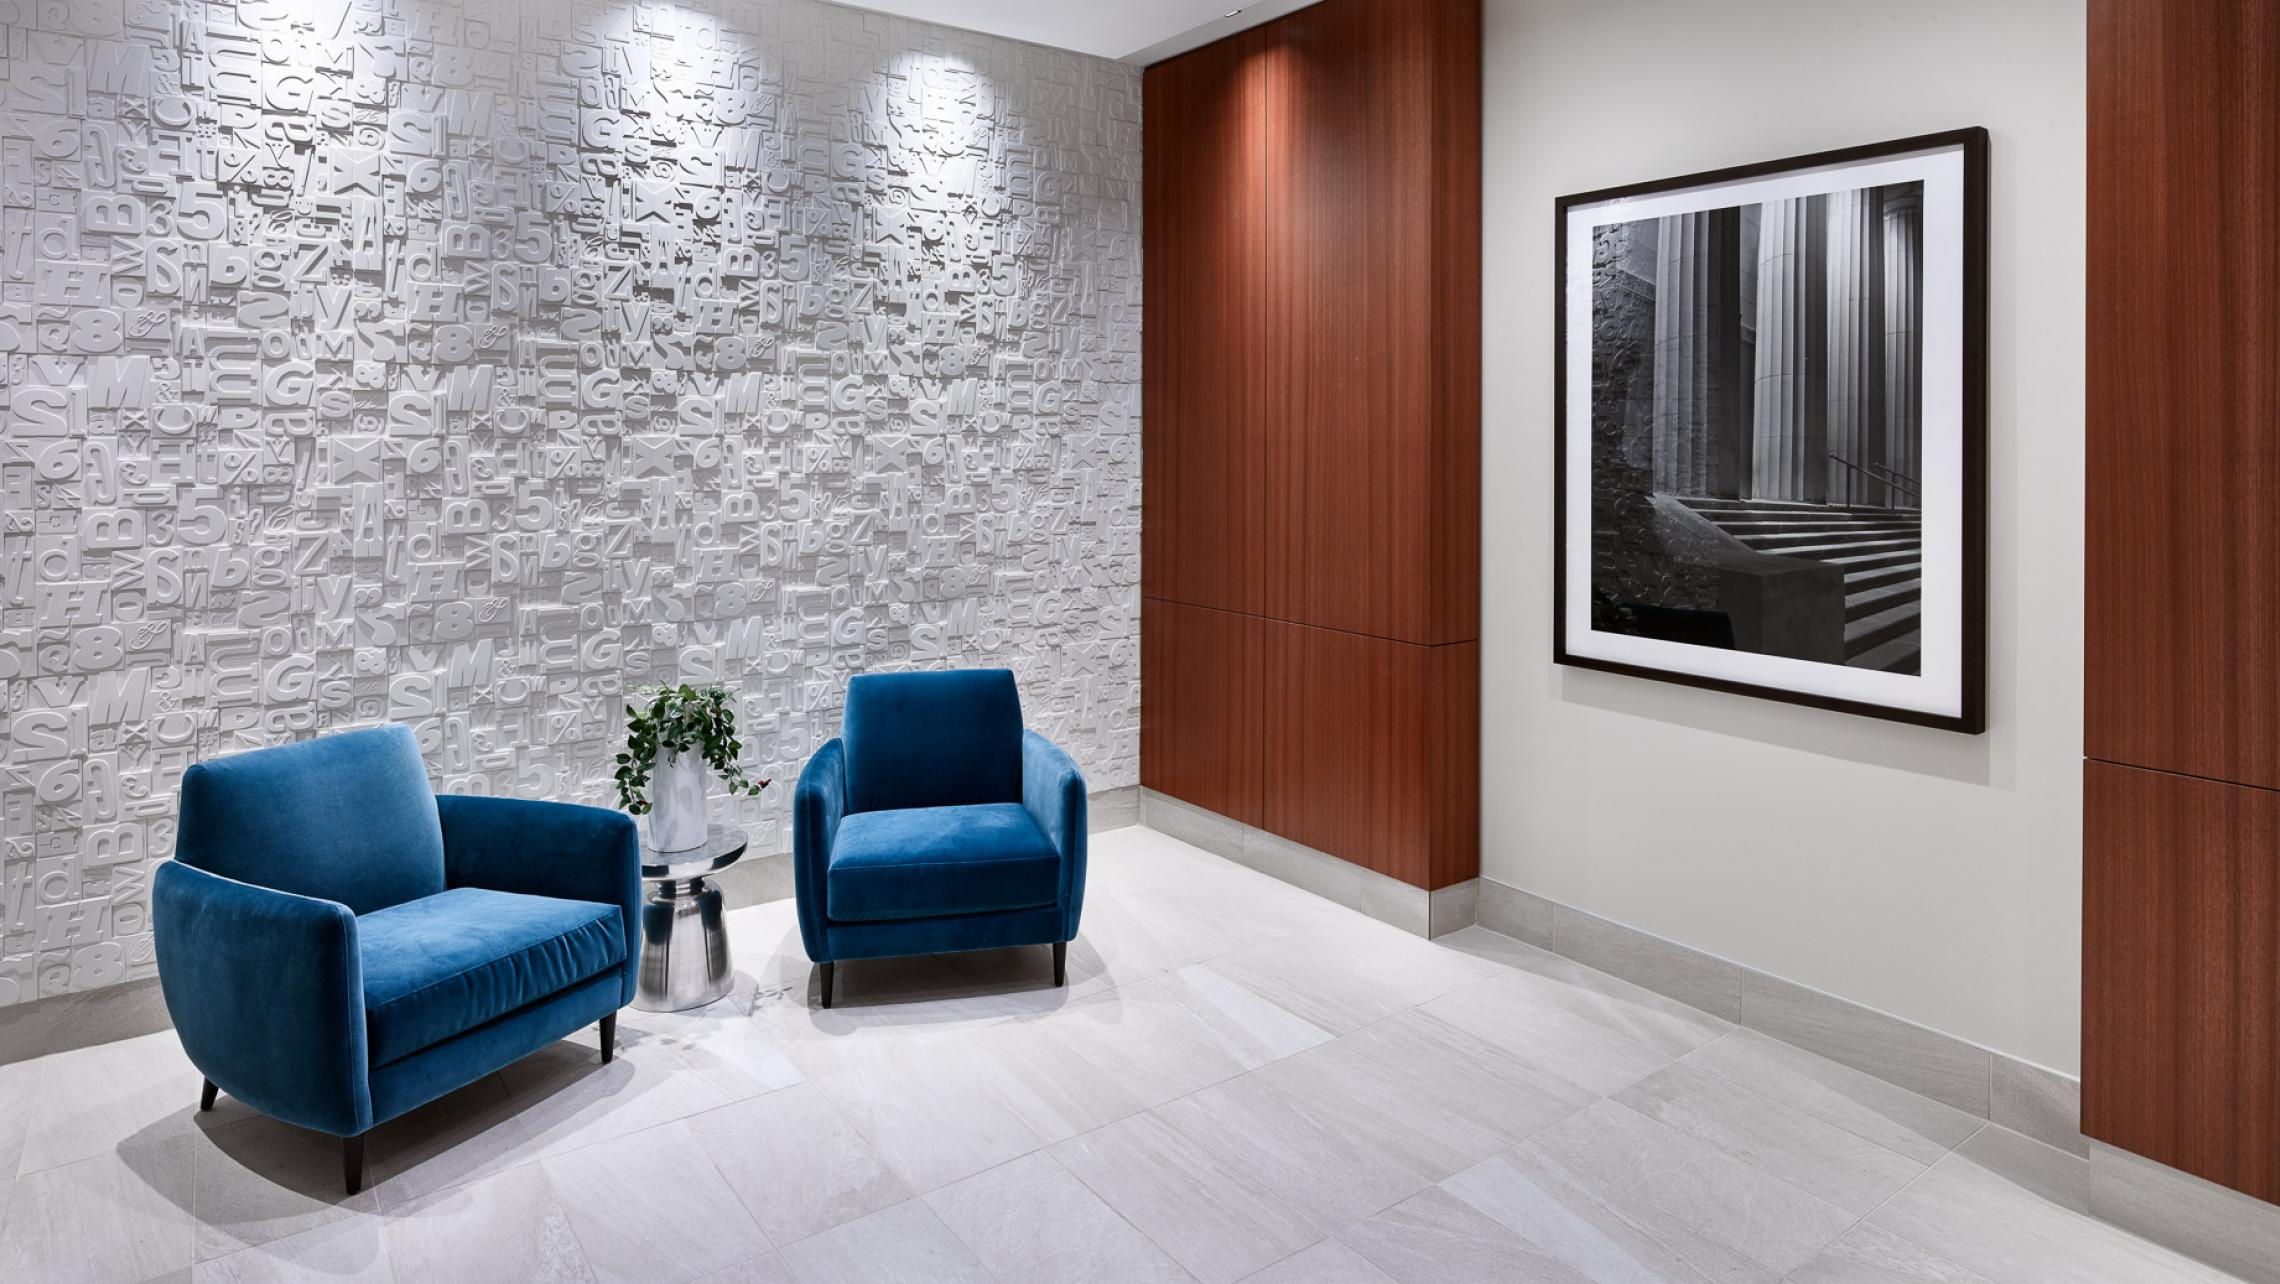 ULI The Pressman Elevator Lobby with Type Wall